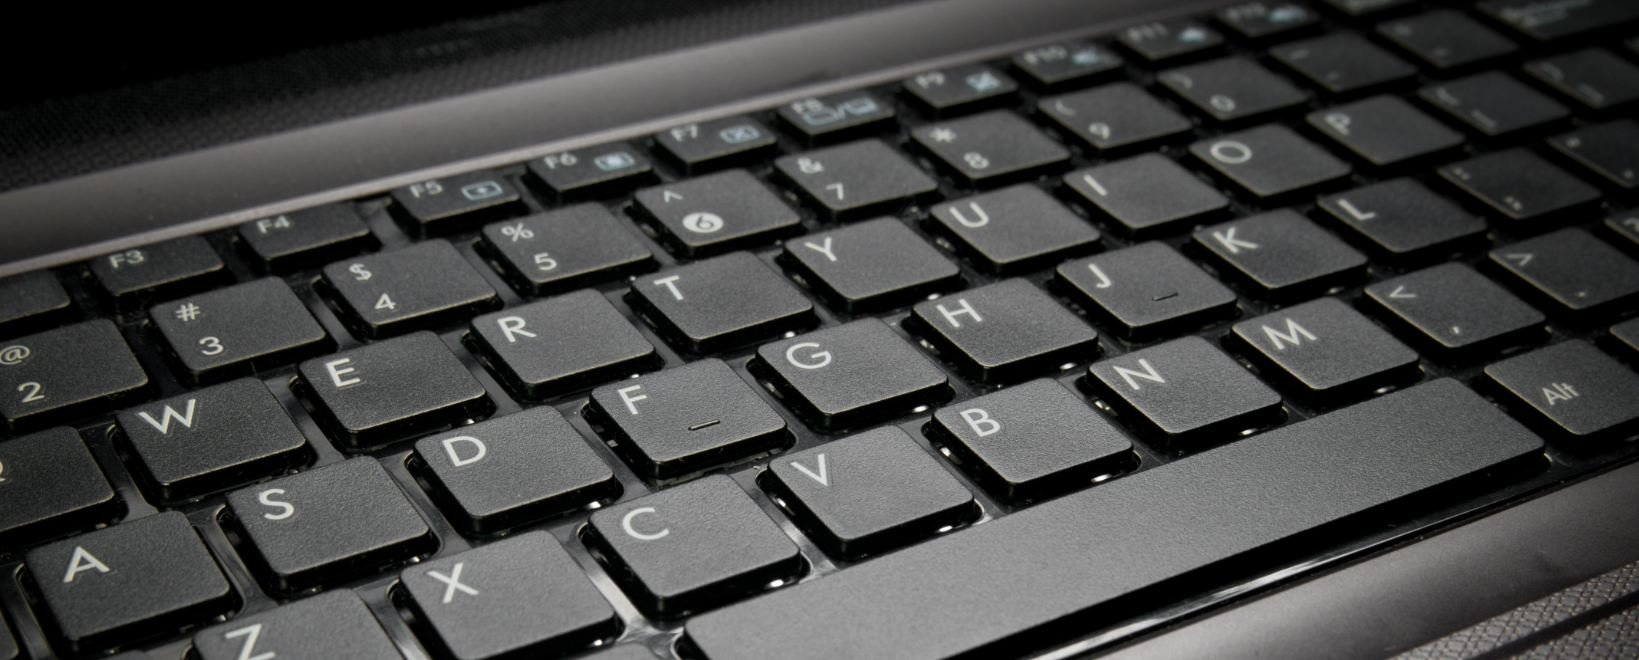 keyboard-f-keys-bbva